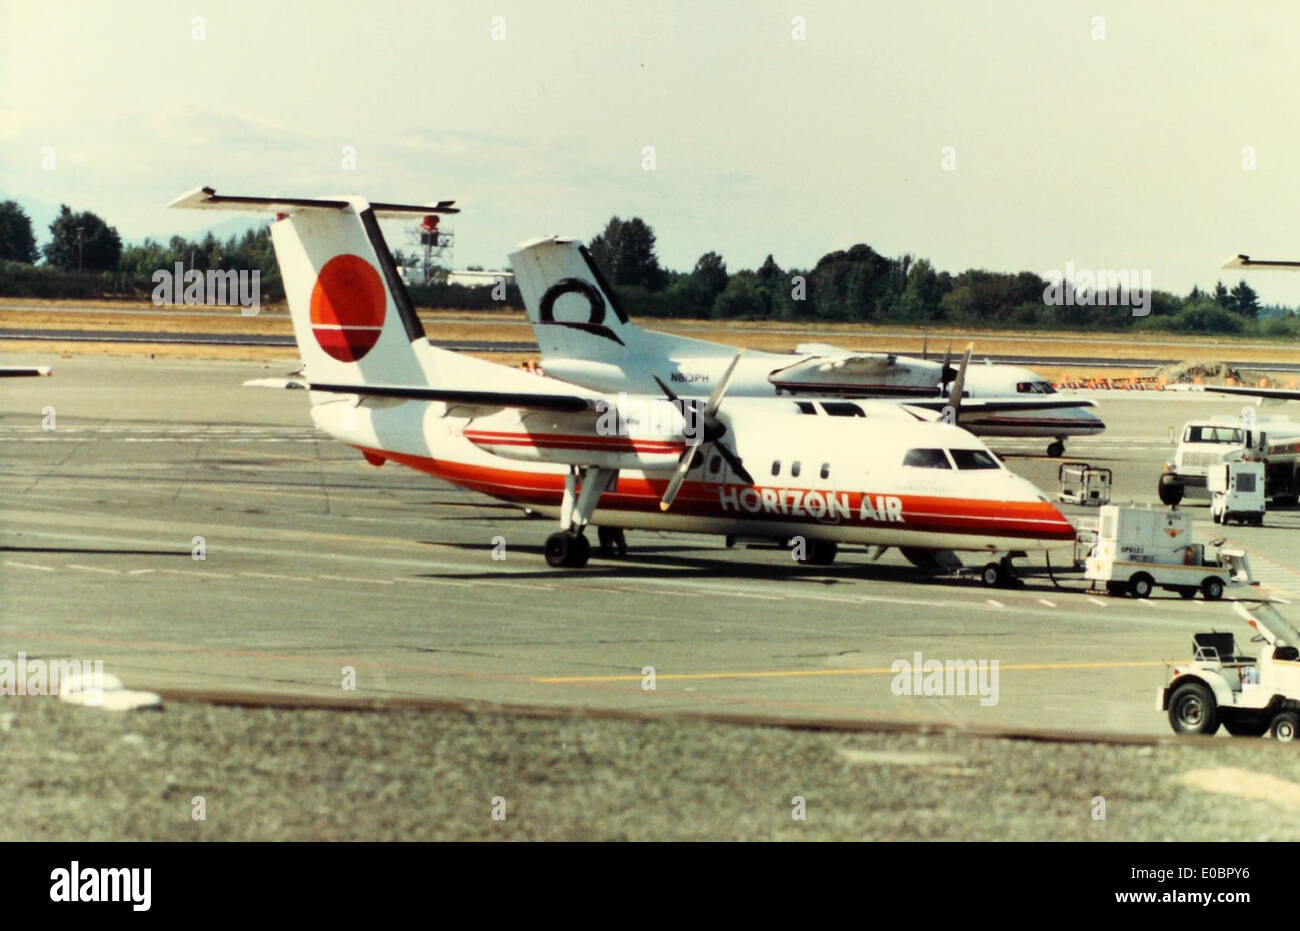 deHavilland Canada, DHC-8, Dash-8 - Stock Image